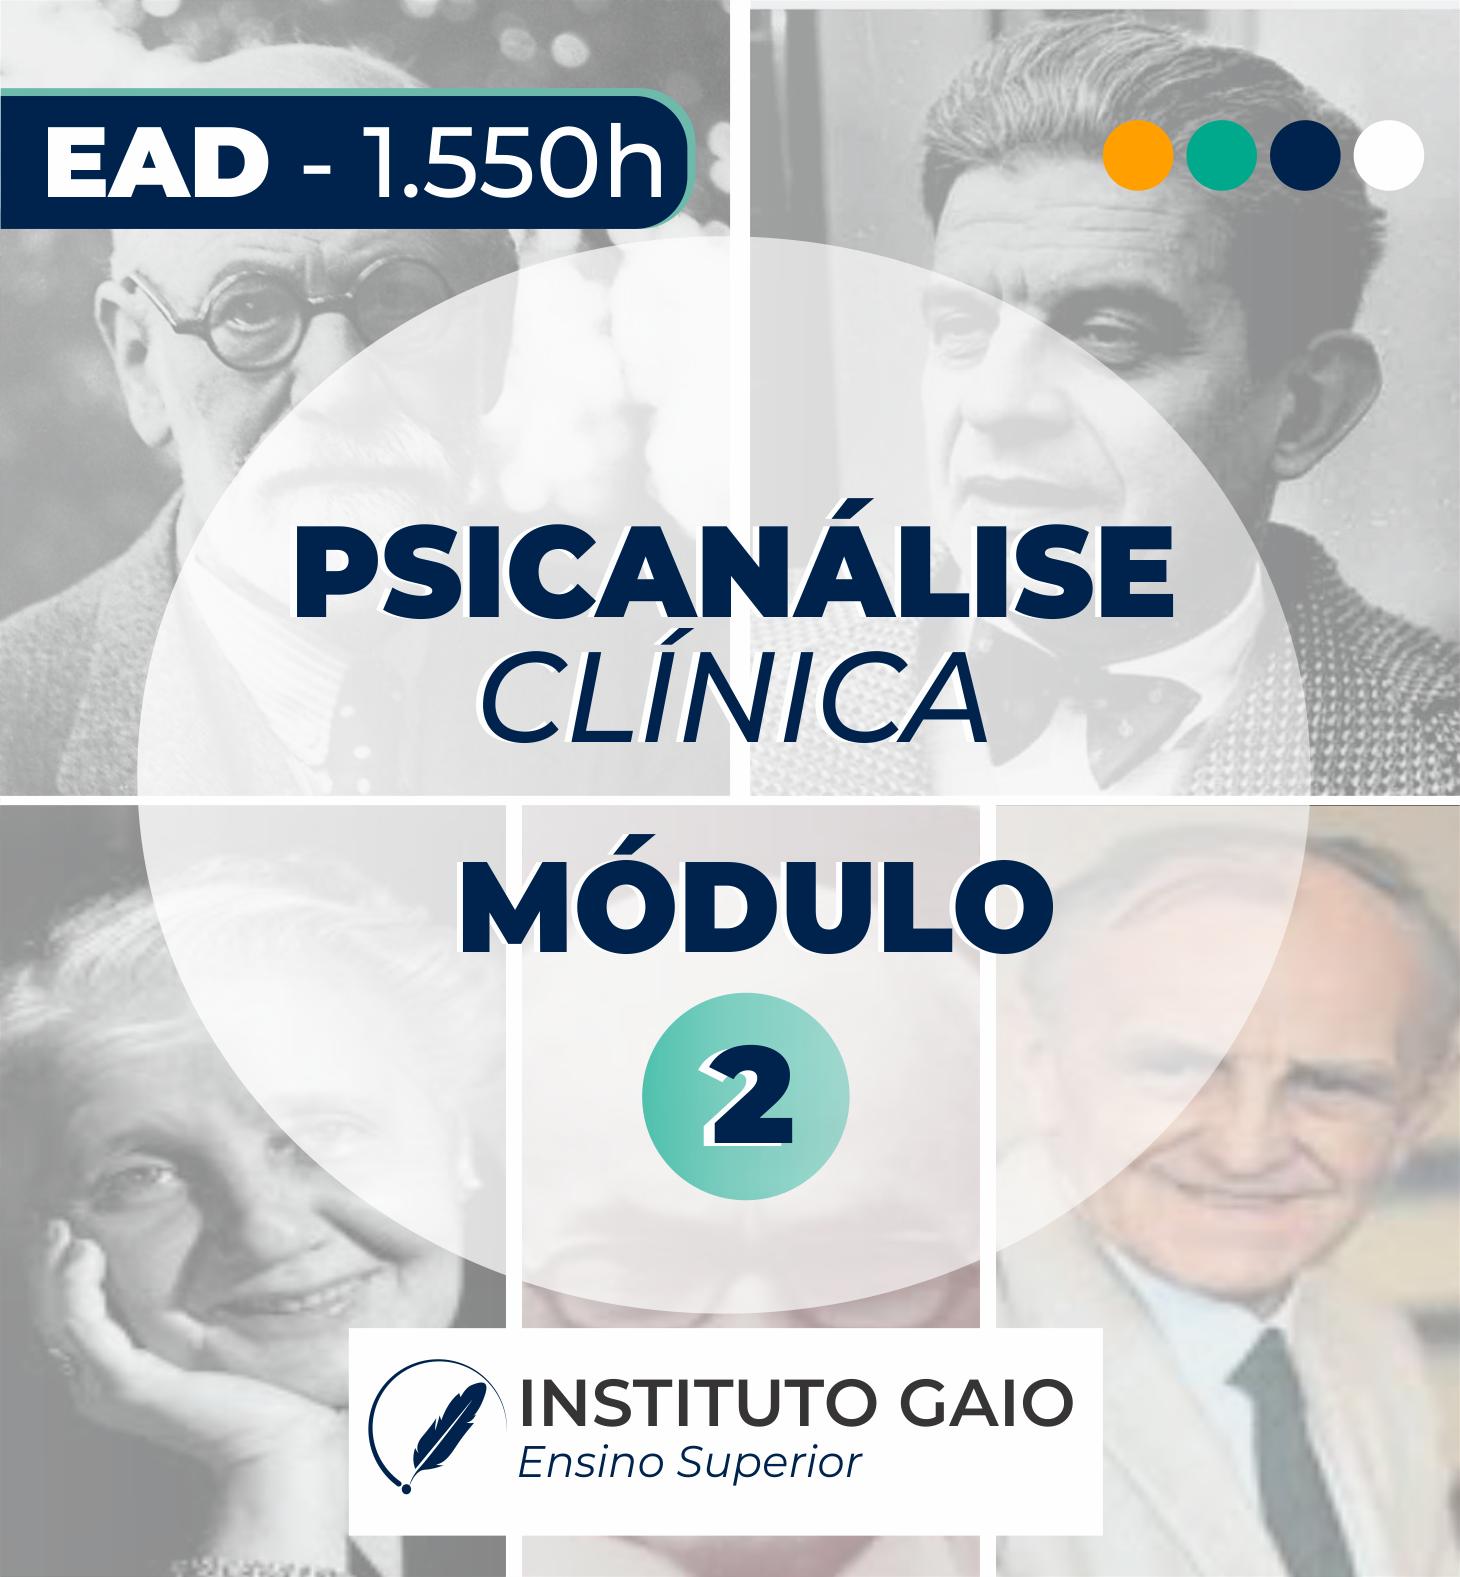 FORMAÇÃO EM PSICANÁLISE CLÍNICA – EAD – MÓDULO 2